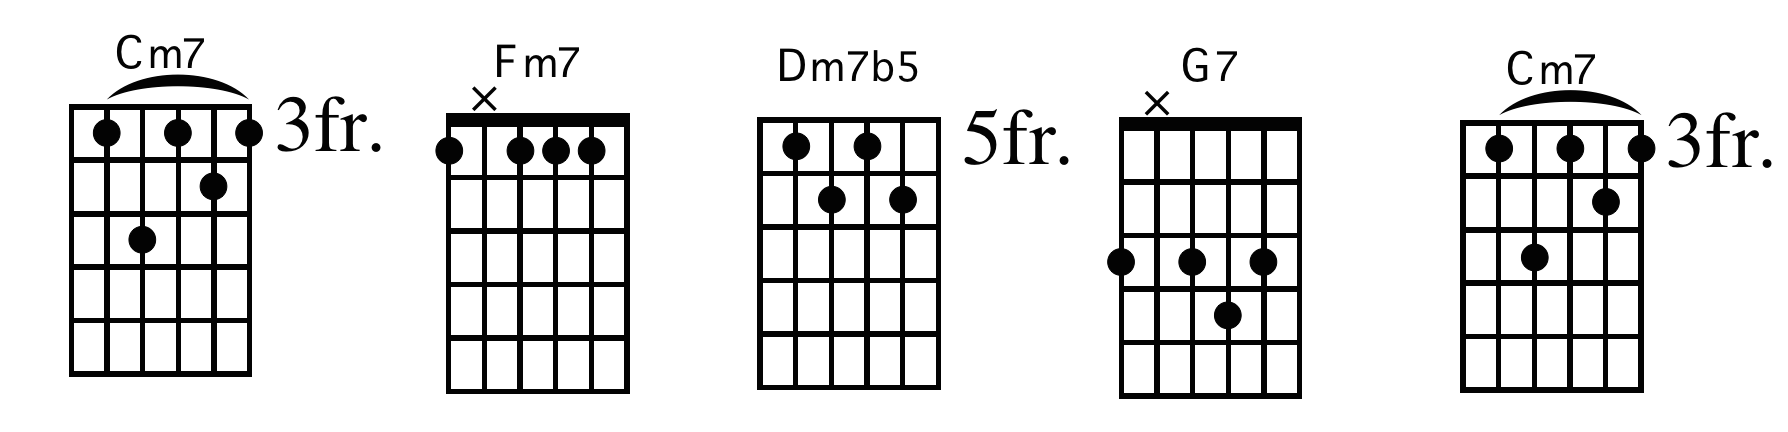 jazz-guitar-practice-routine_2.png